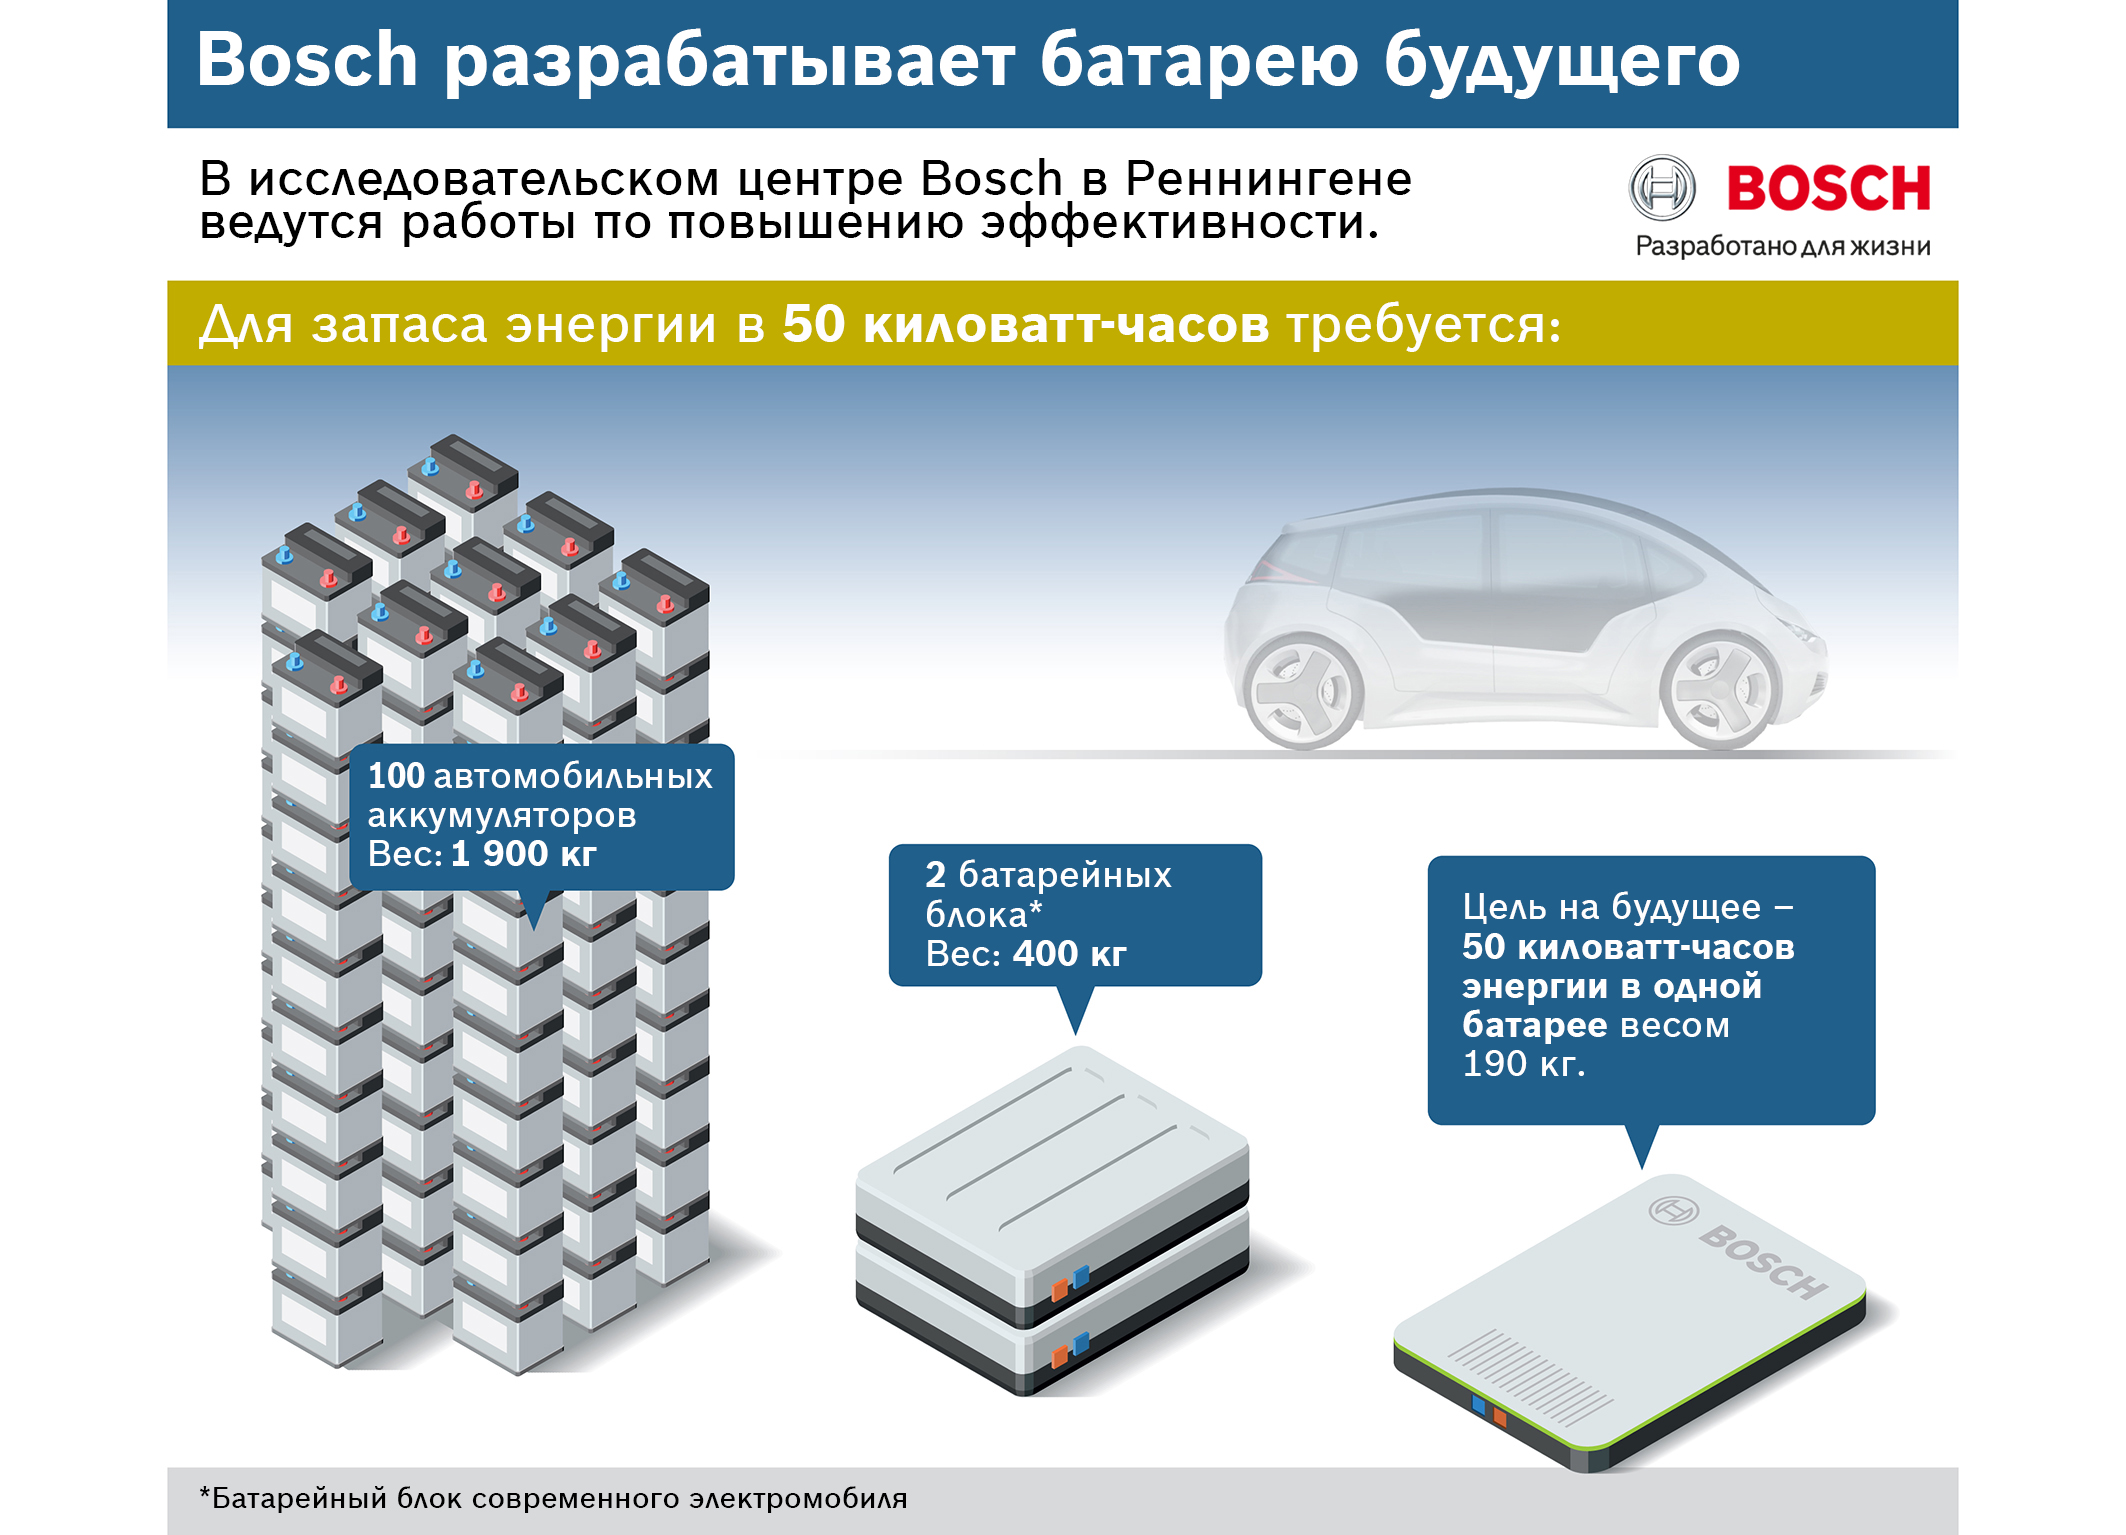 battery technology mobile cars